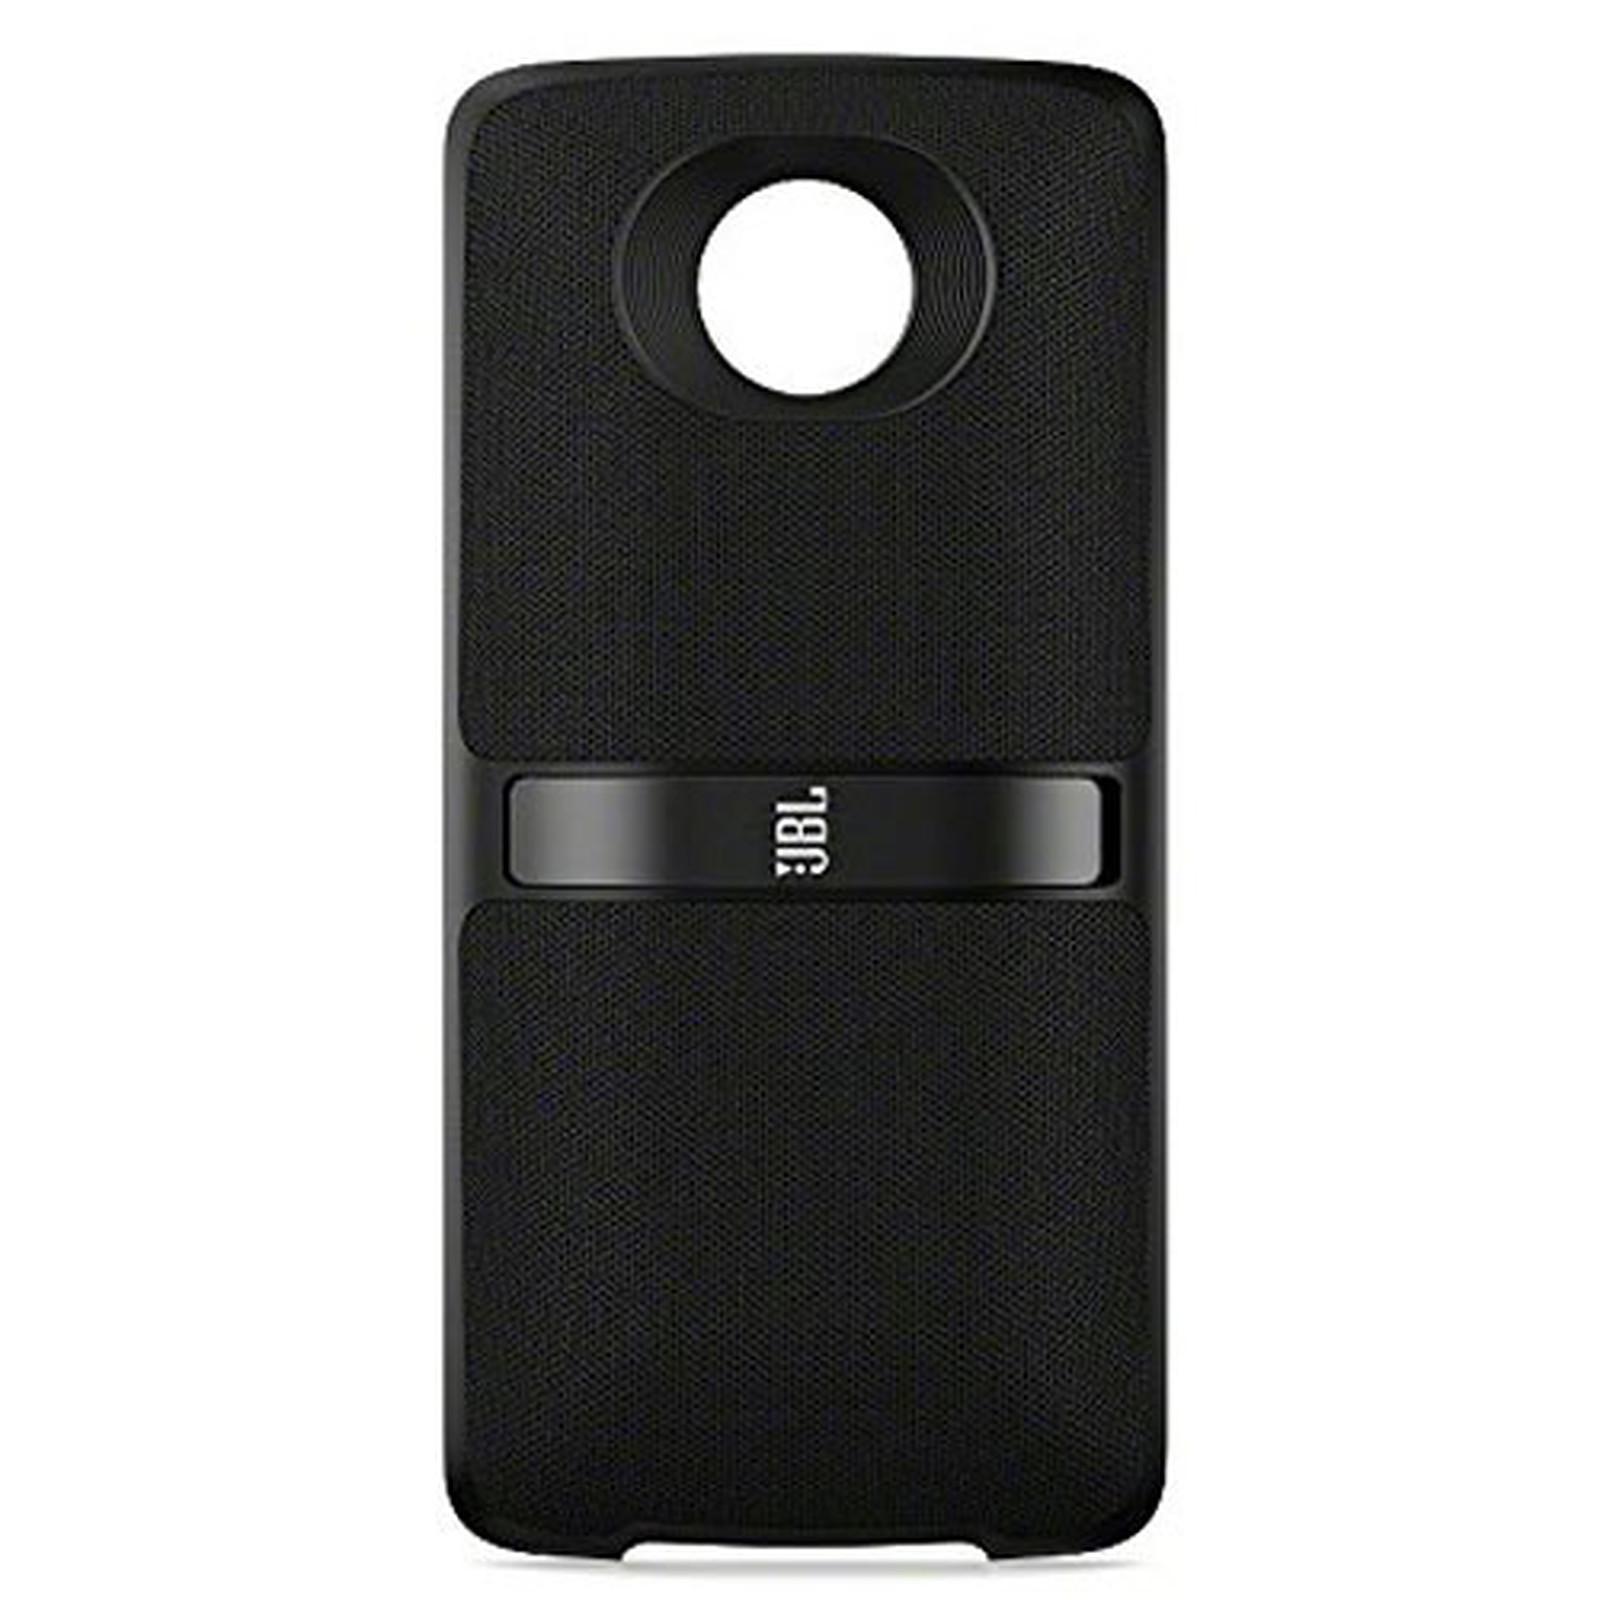 motorola mods 2017 soundboost 2 noir accessoires divers smartphone motorola sur. Black Bedroom Furniture Sets. Home Design Ideas